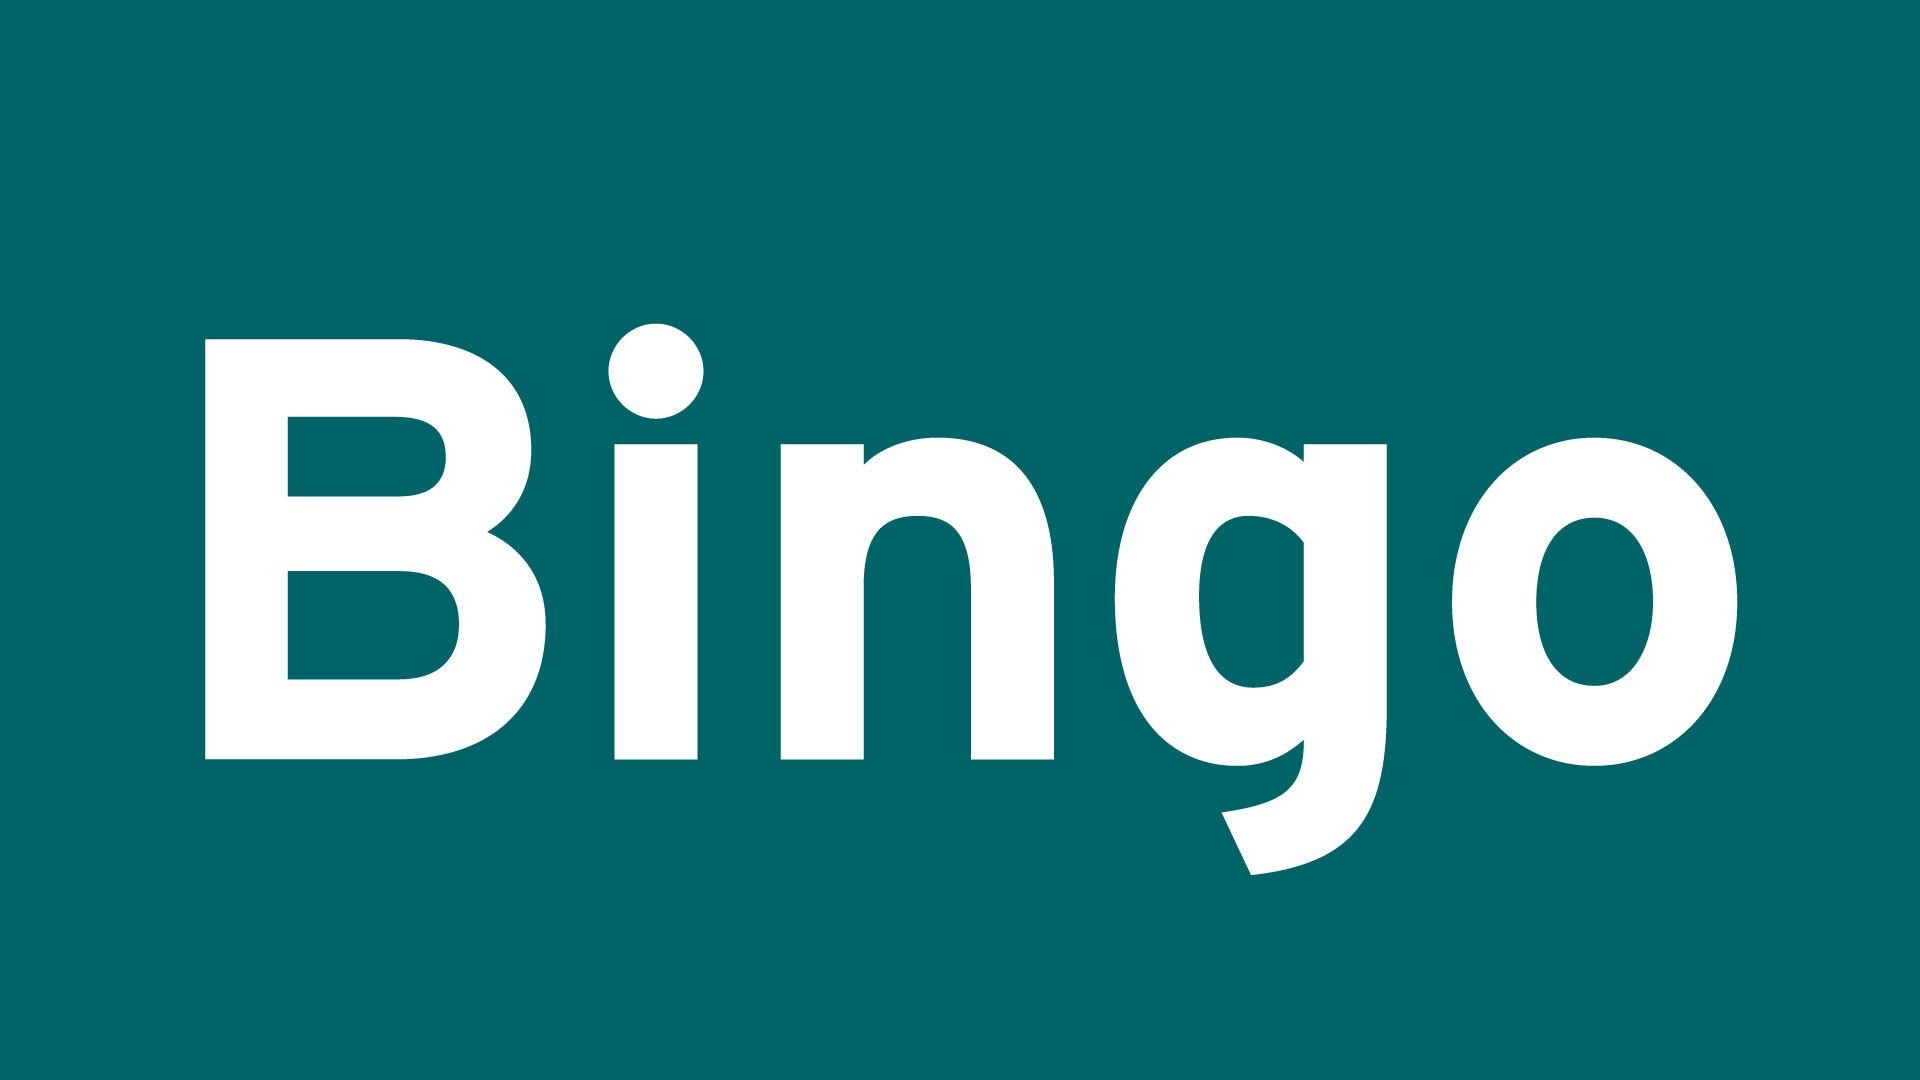 The word Bingo in white, sans-serif type on a green background.